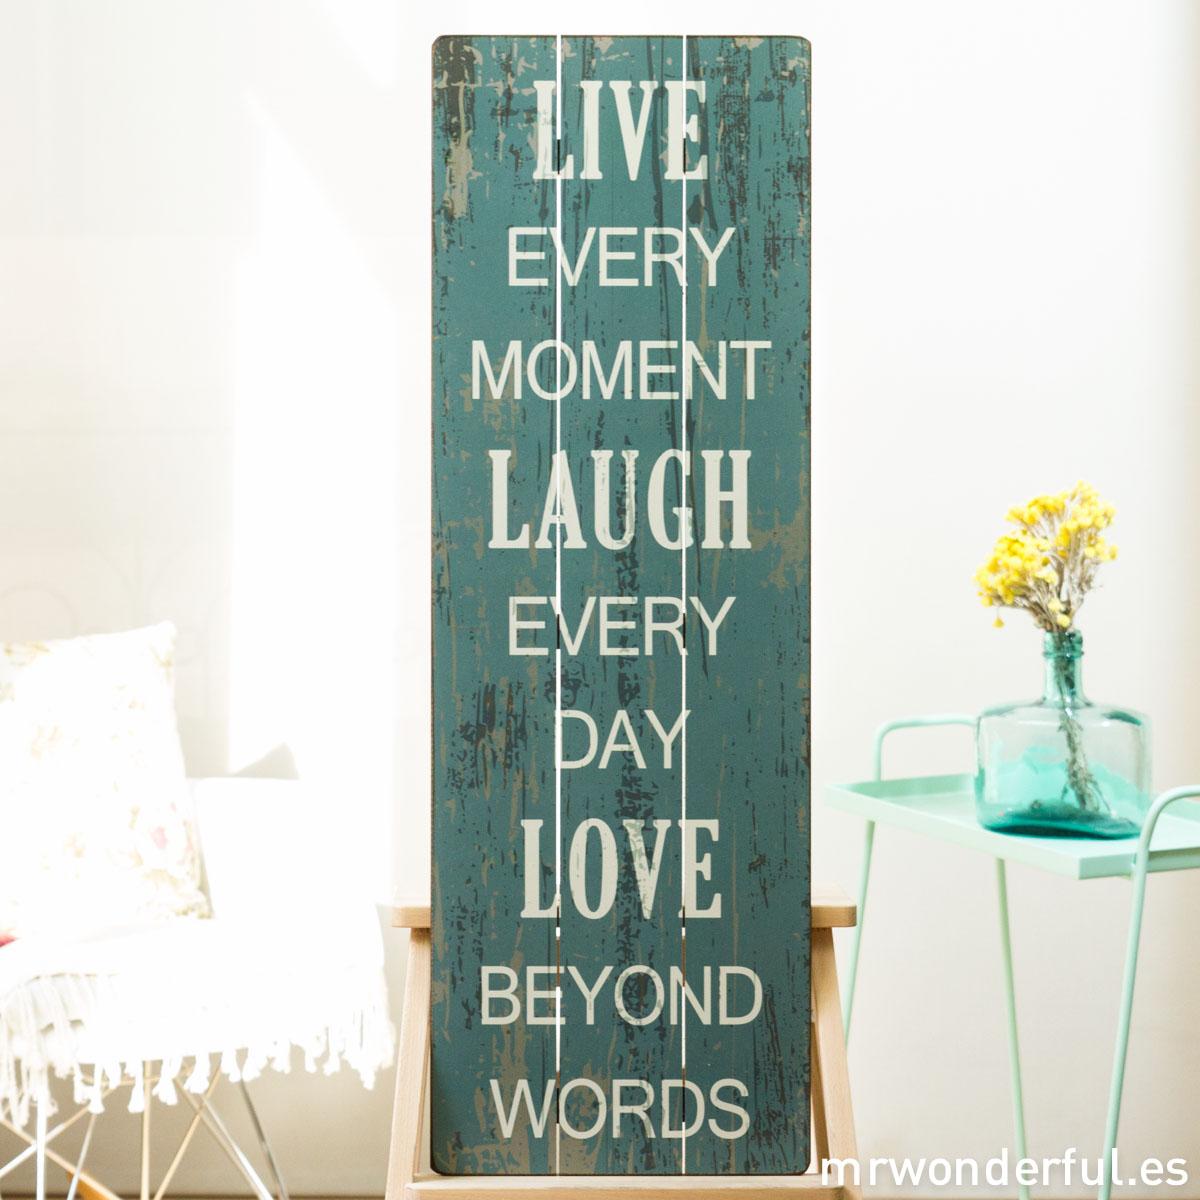 mrwonderful_GI6006_1_letrero-madera-mediano_live-every-moment-2